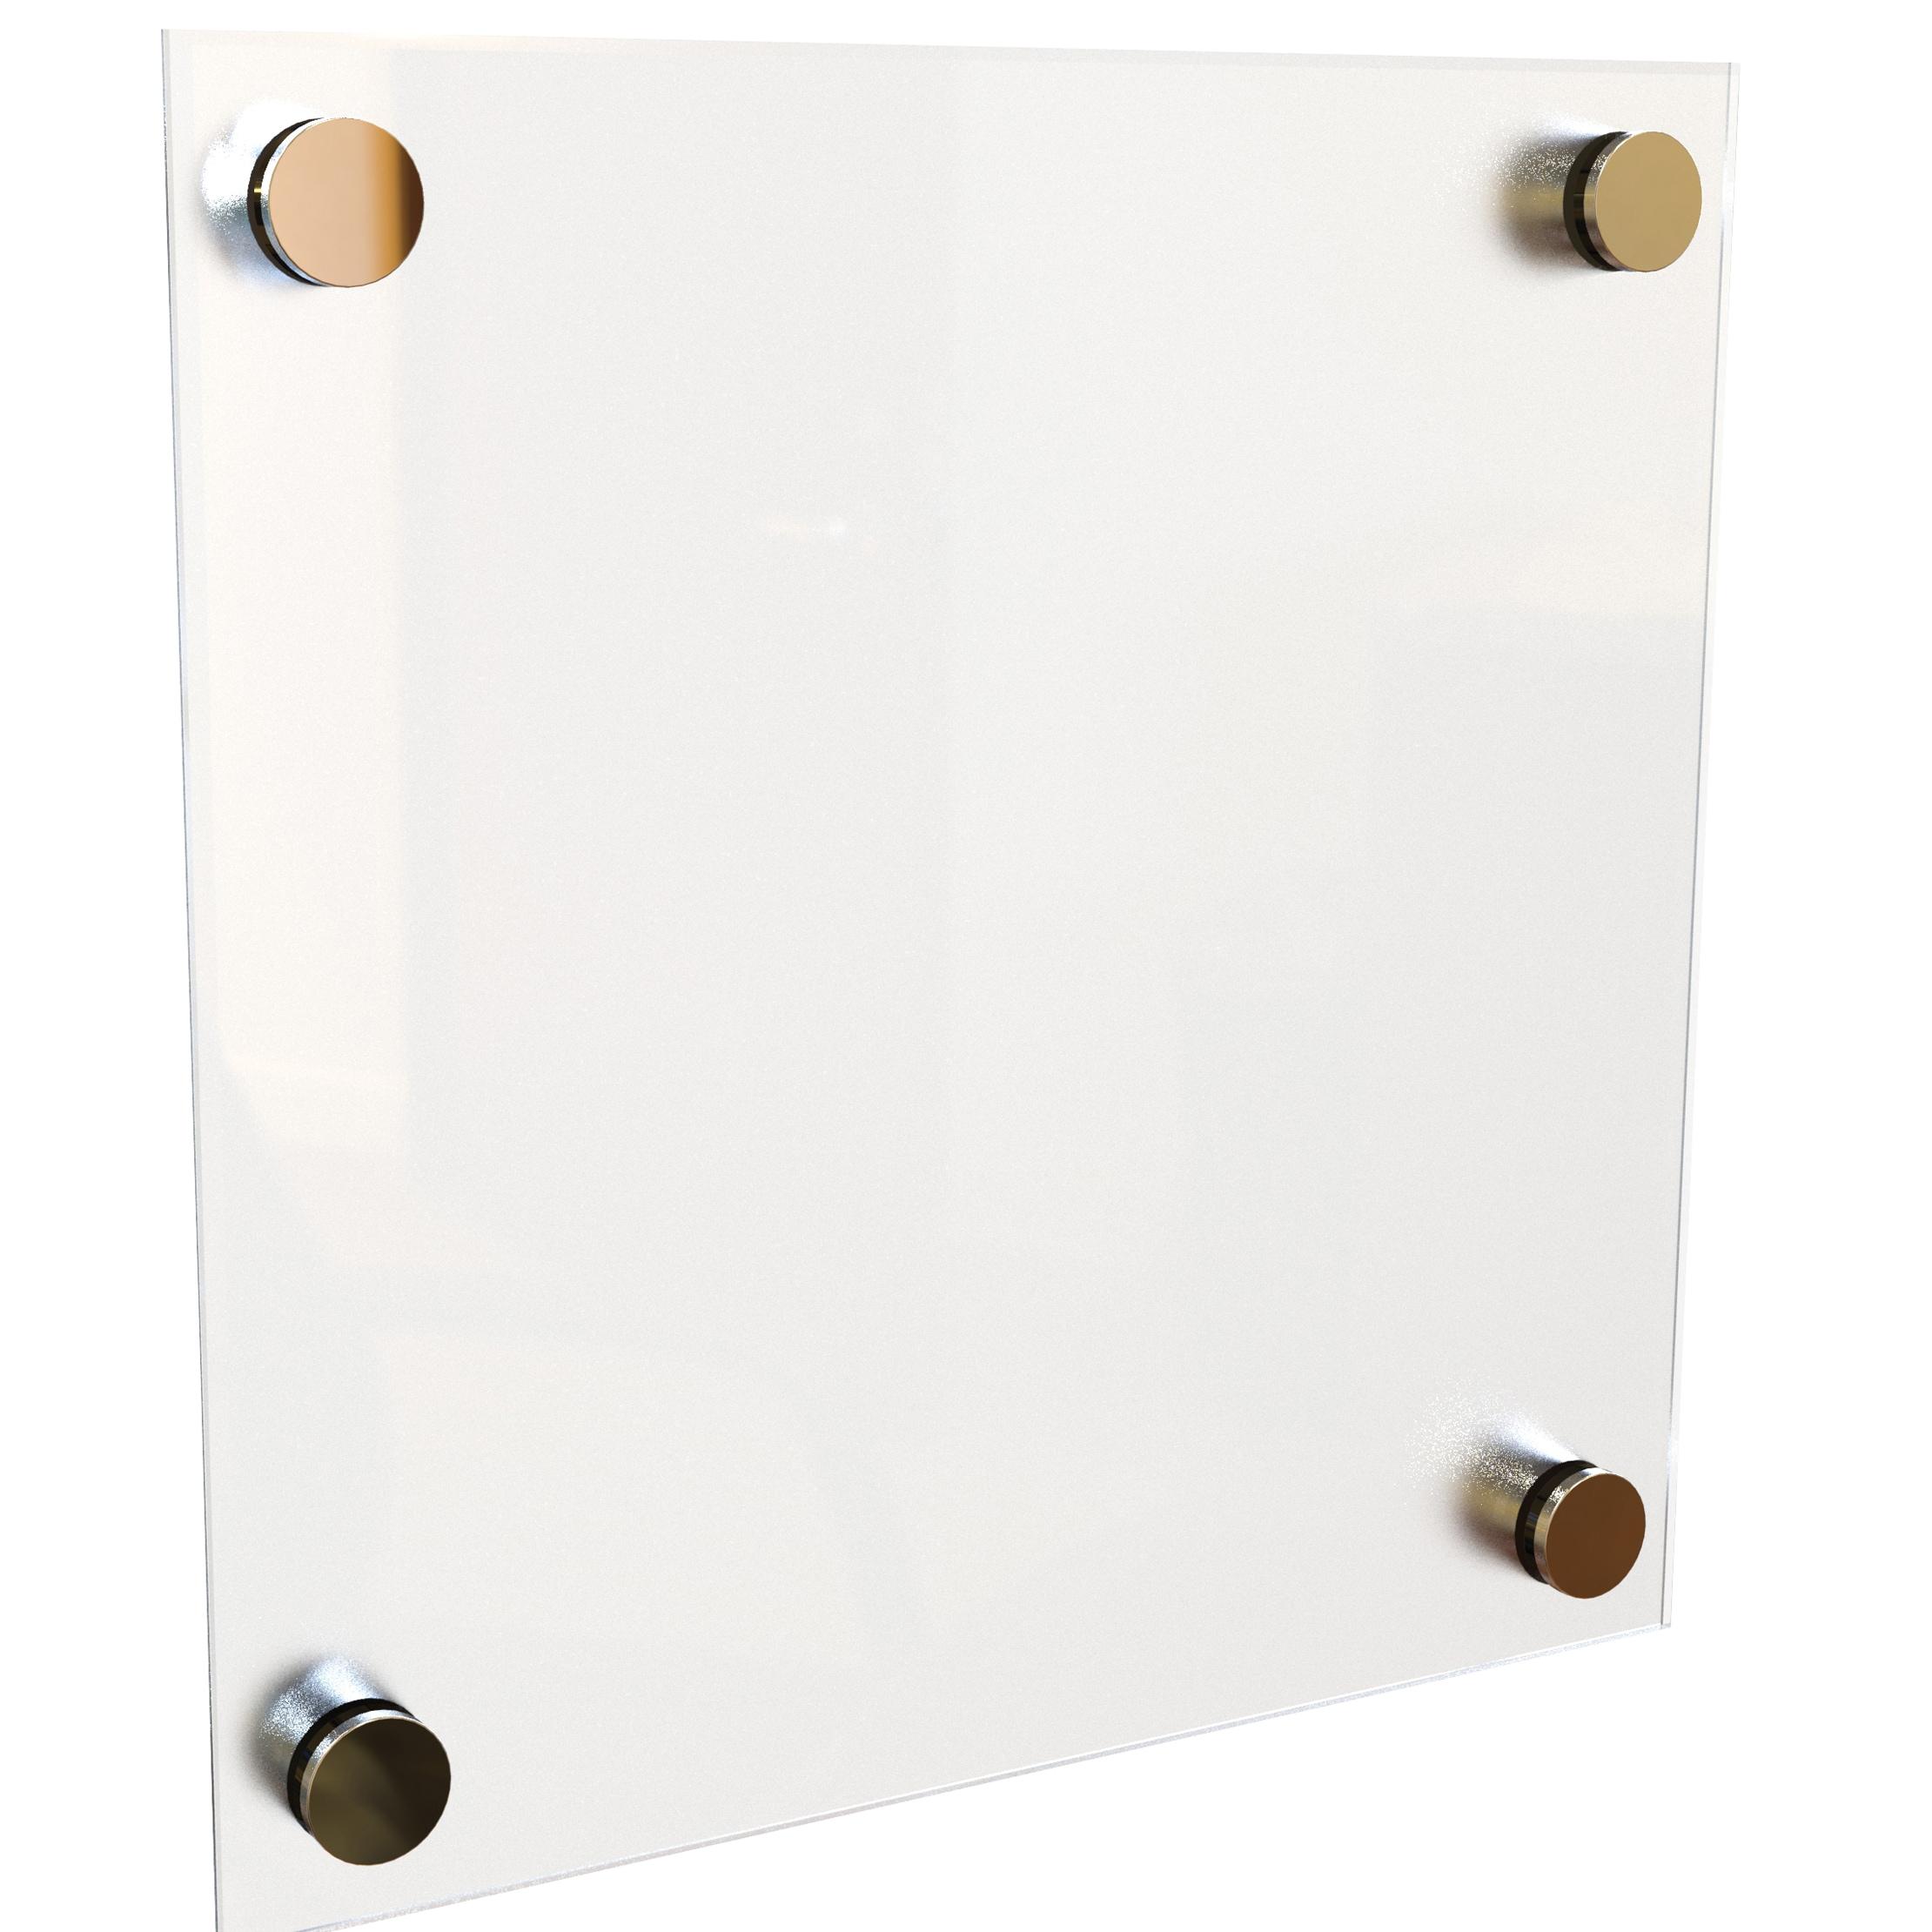 Best-Rite 1 x 1 Enlighten Glass Dry Erase Board